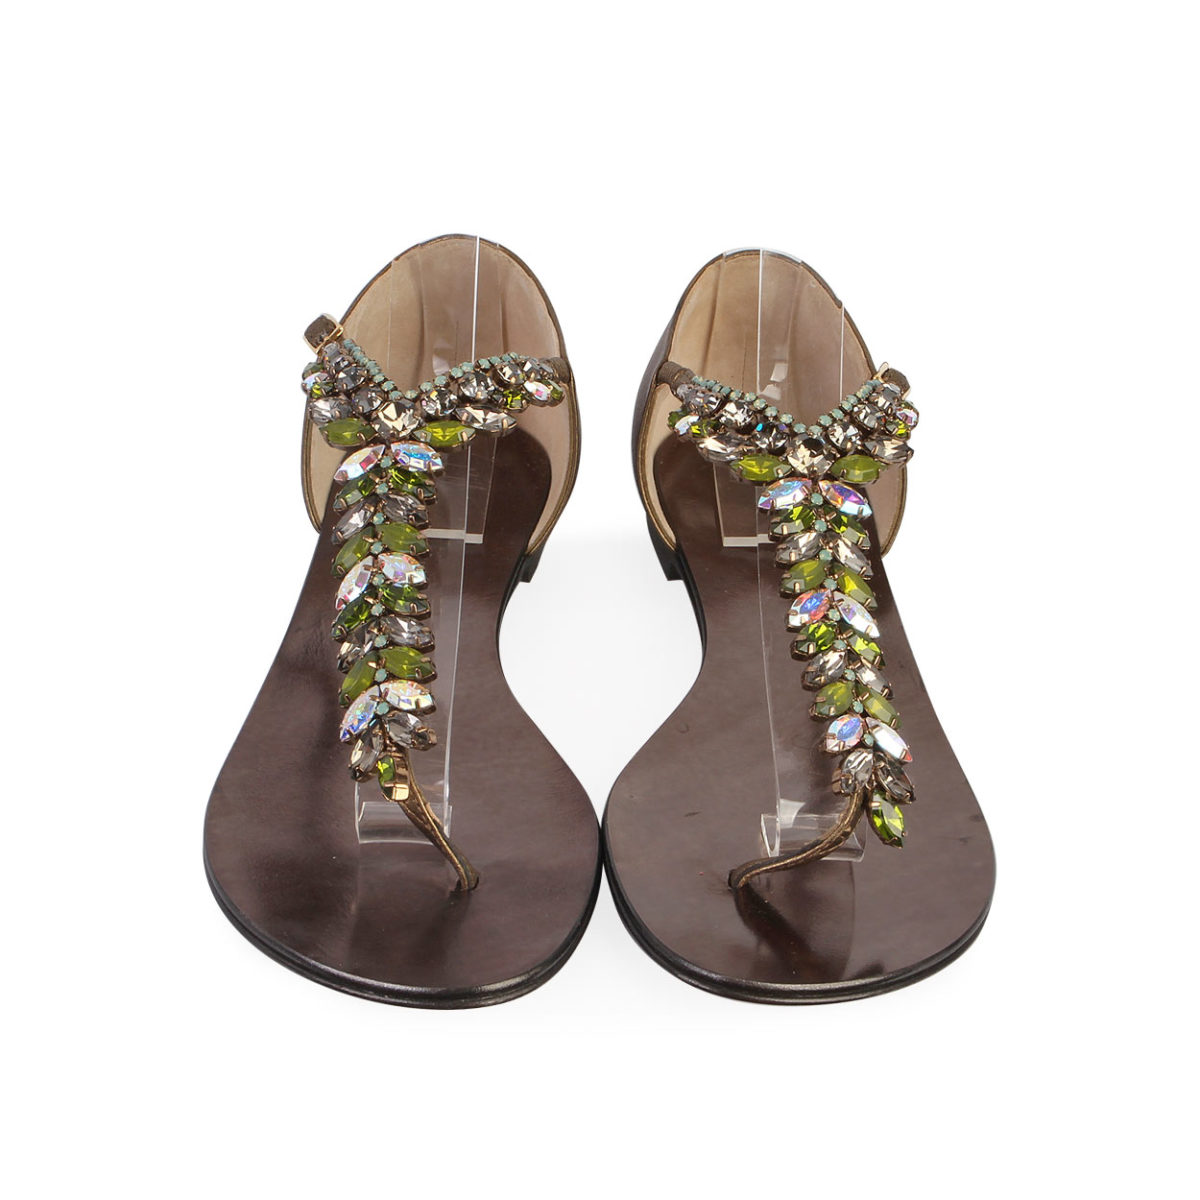 e77d85b80bf8 GIUSEPPE ZANOTTI Metallic Leather Jewel Embellished Flat Sandals - S ...